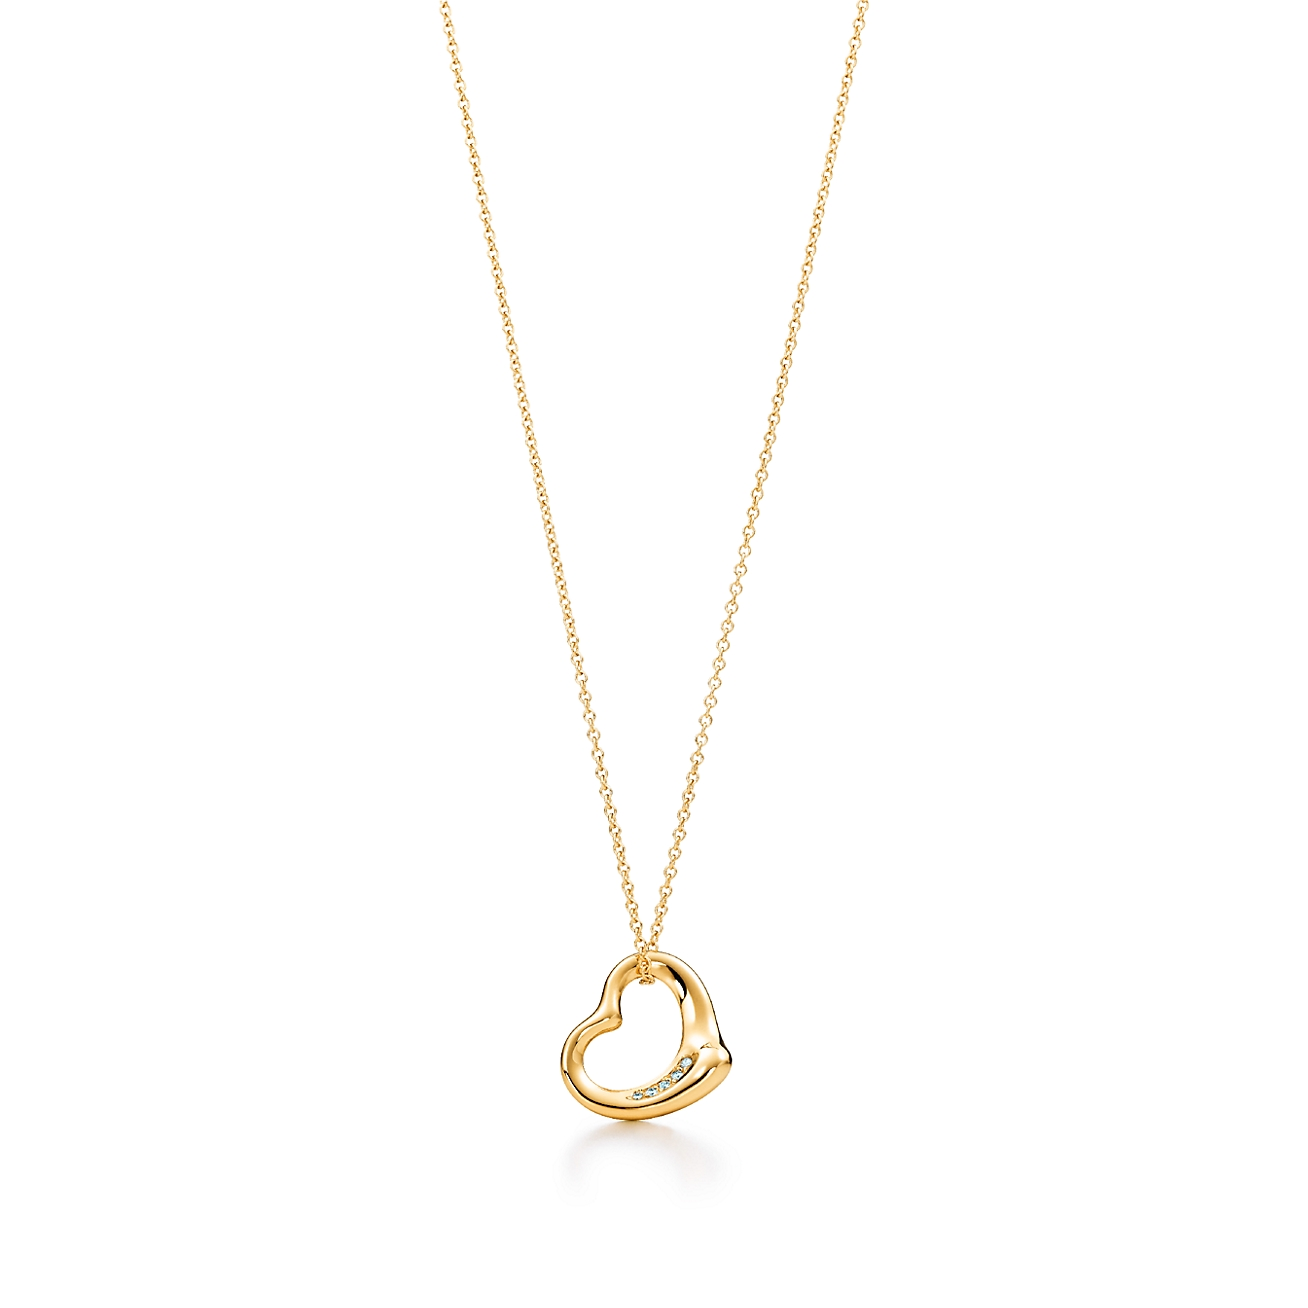 Elsa peretti open heart pendant in 18k gold with diamonds deletelarge elsa perettiopen heart pendant aloadofball Gallery